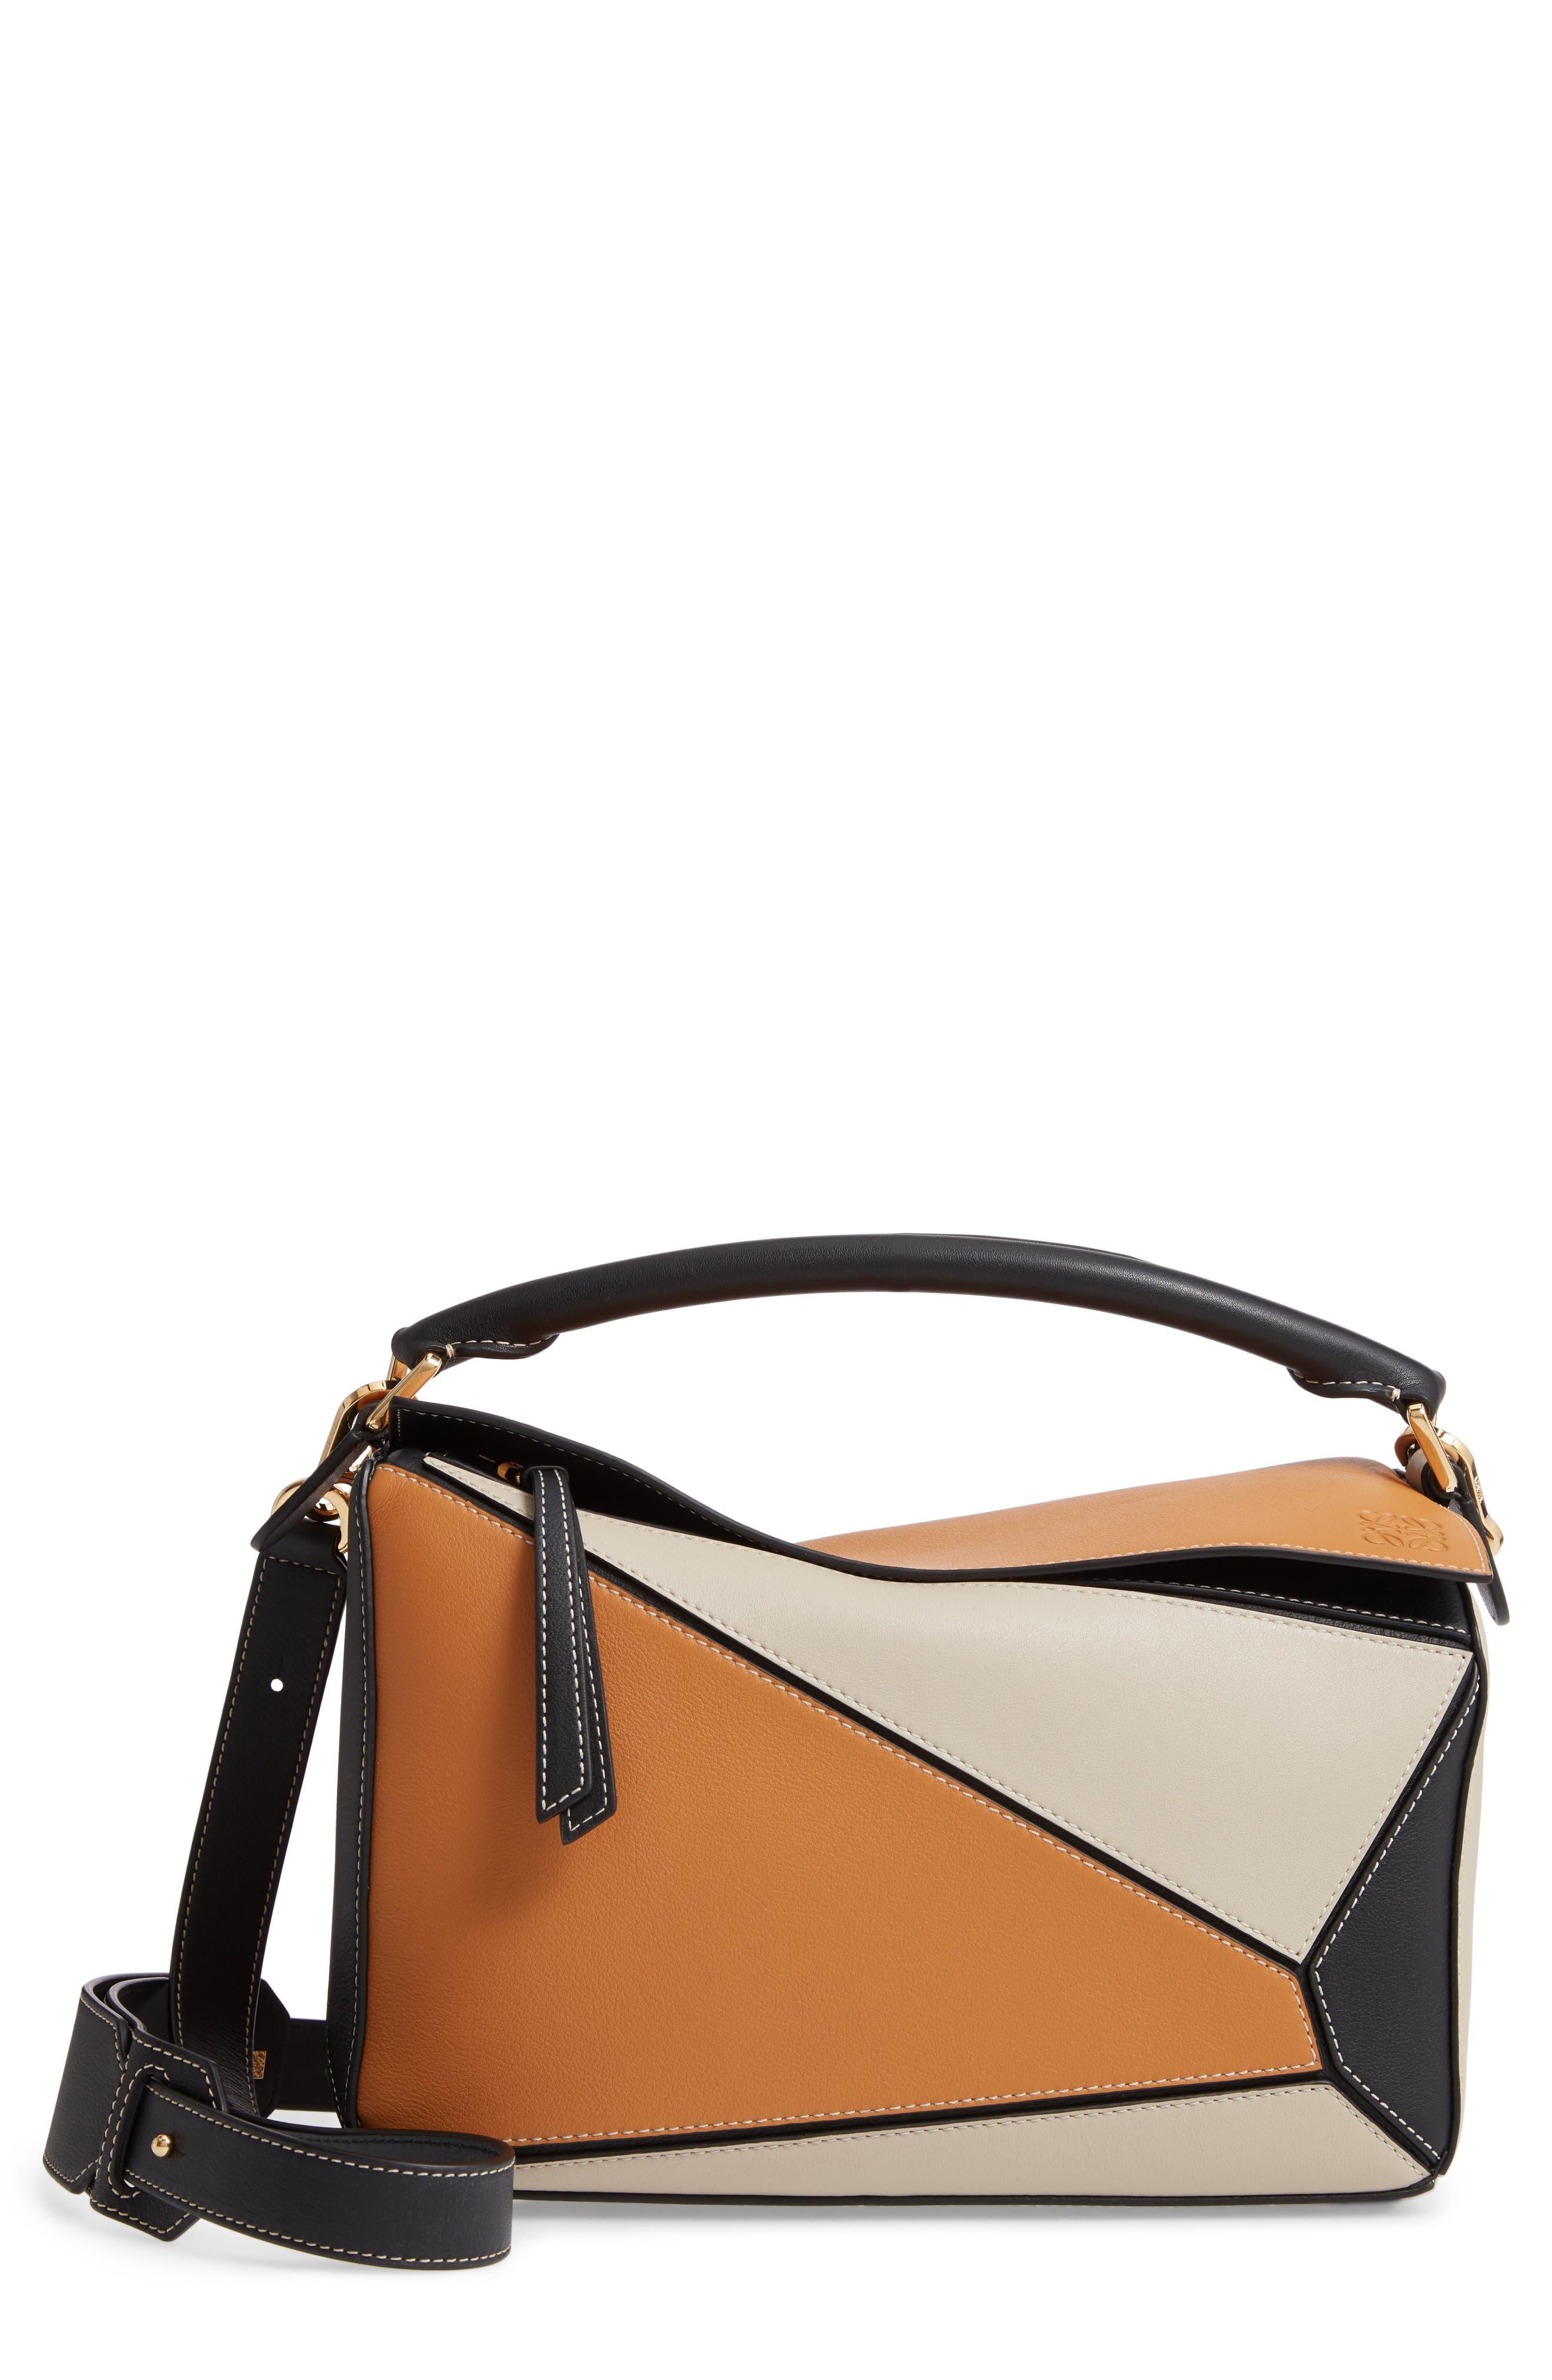 LOEWE,                             Puzzle Calfskin Leather Shoulder Bag,                             Main thumbnail 1, color,                             AMBER/ LIGHT OAT